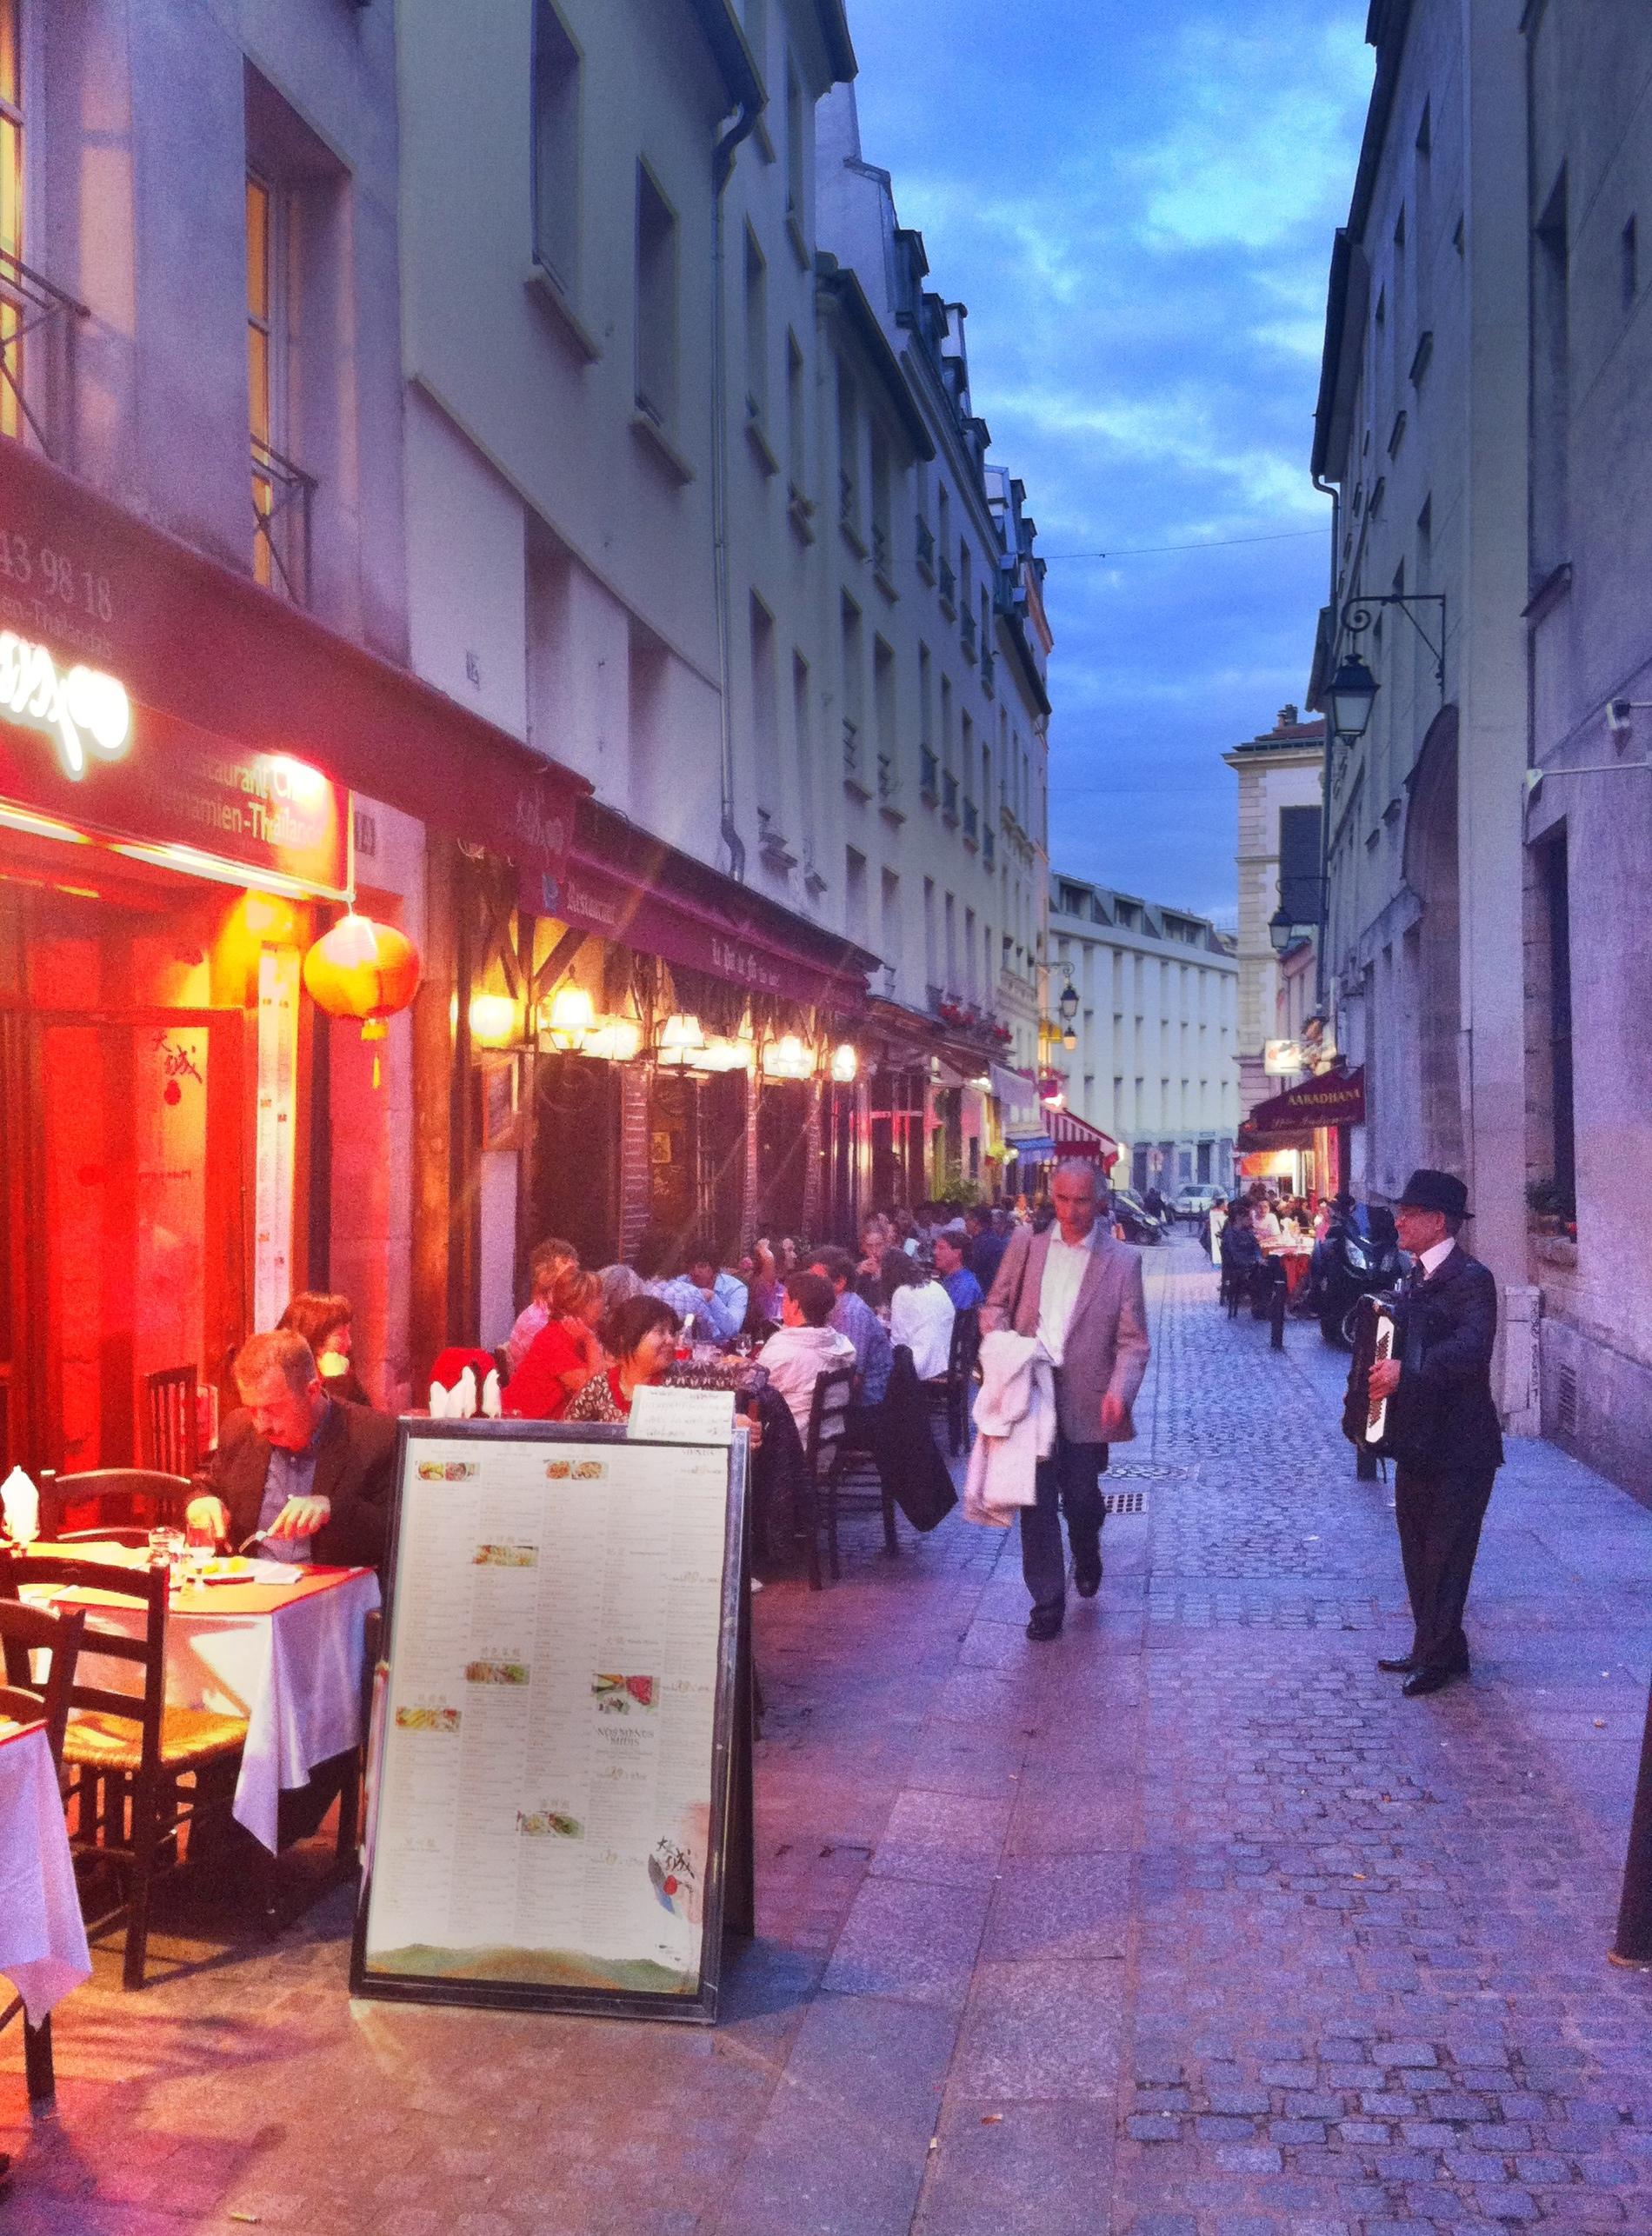 rue du pot de fer wandering around the quarter near flickr photo